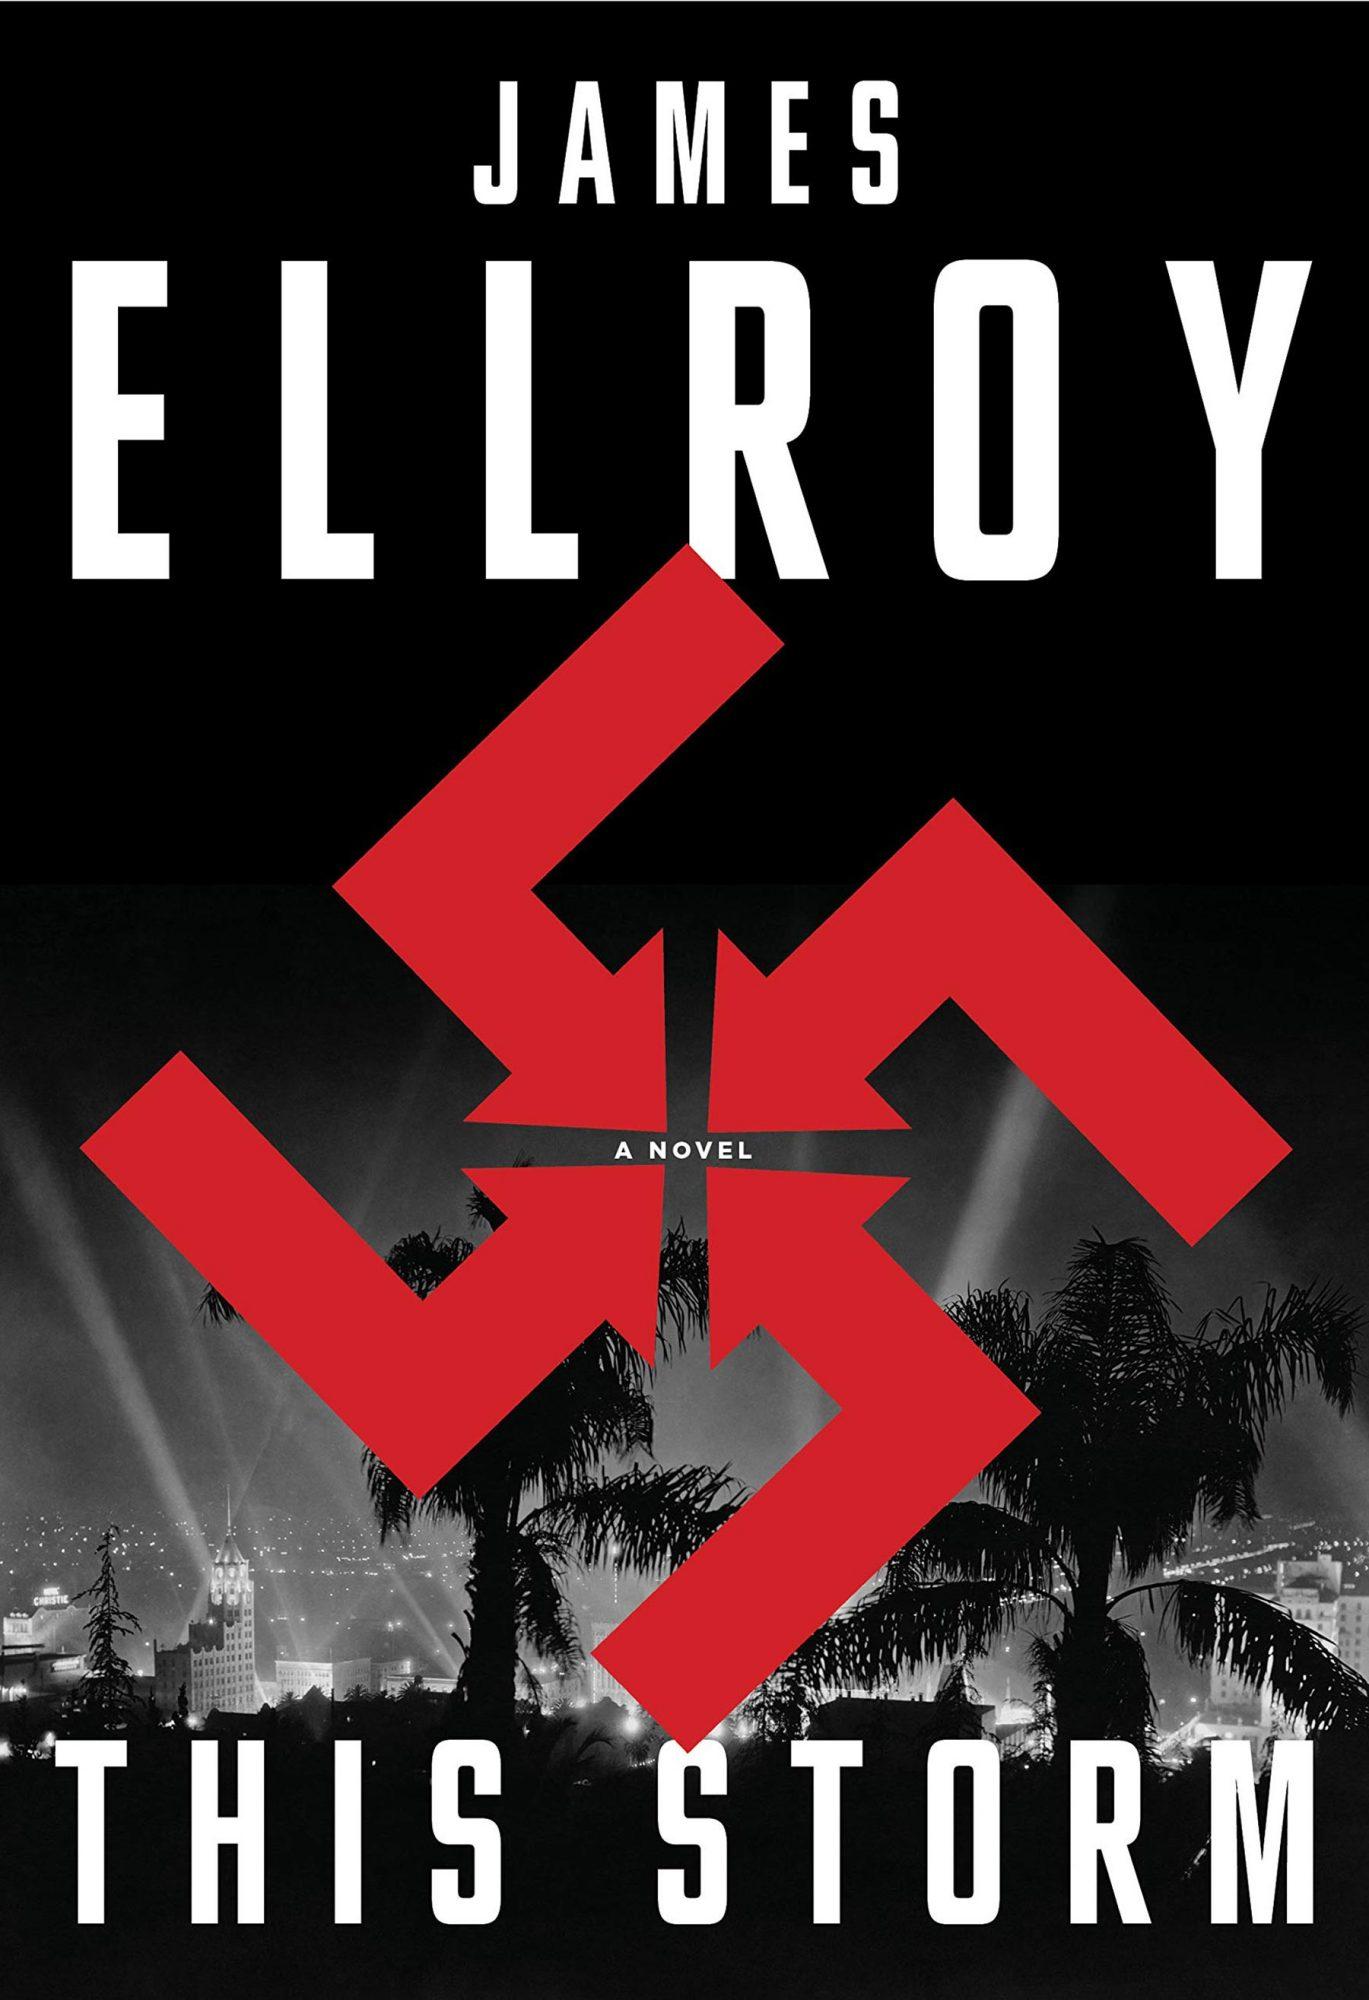 James Ellroy, This StormPublisher: Knopf